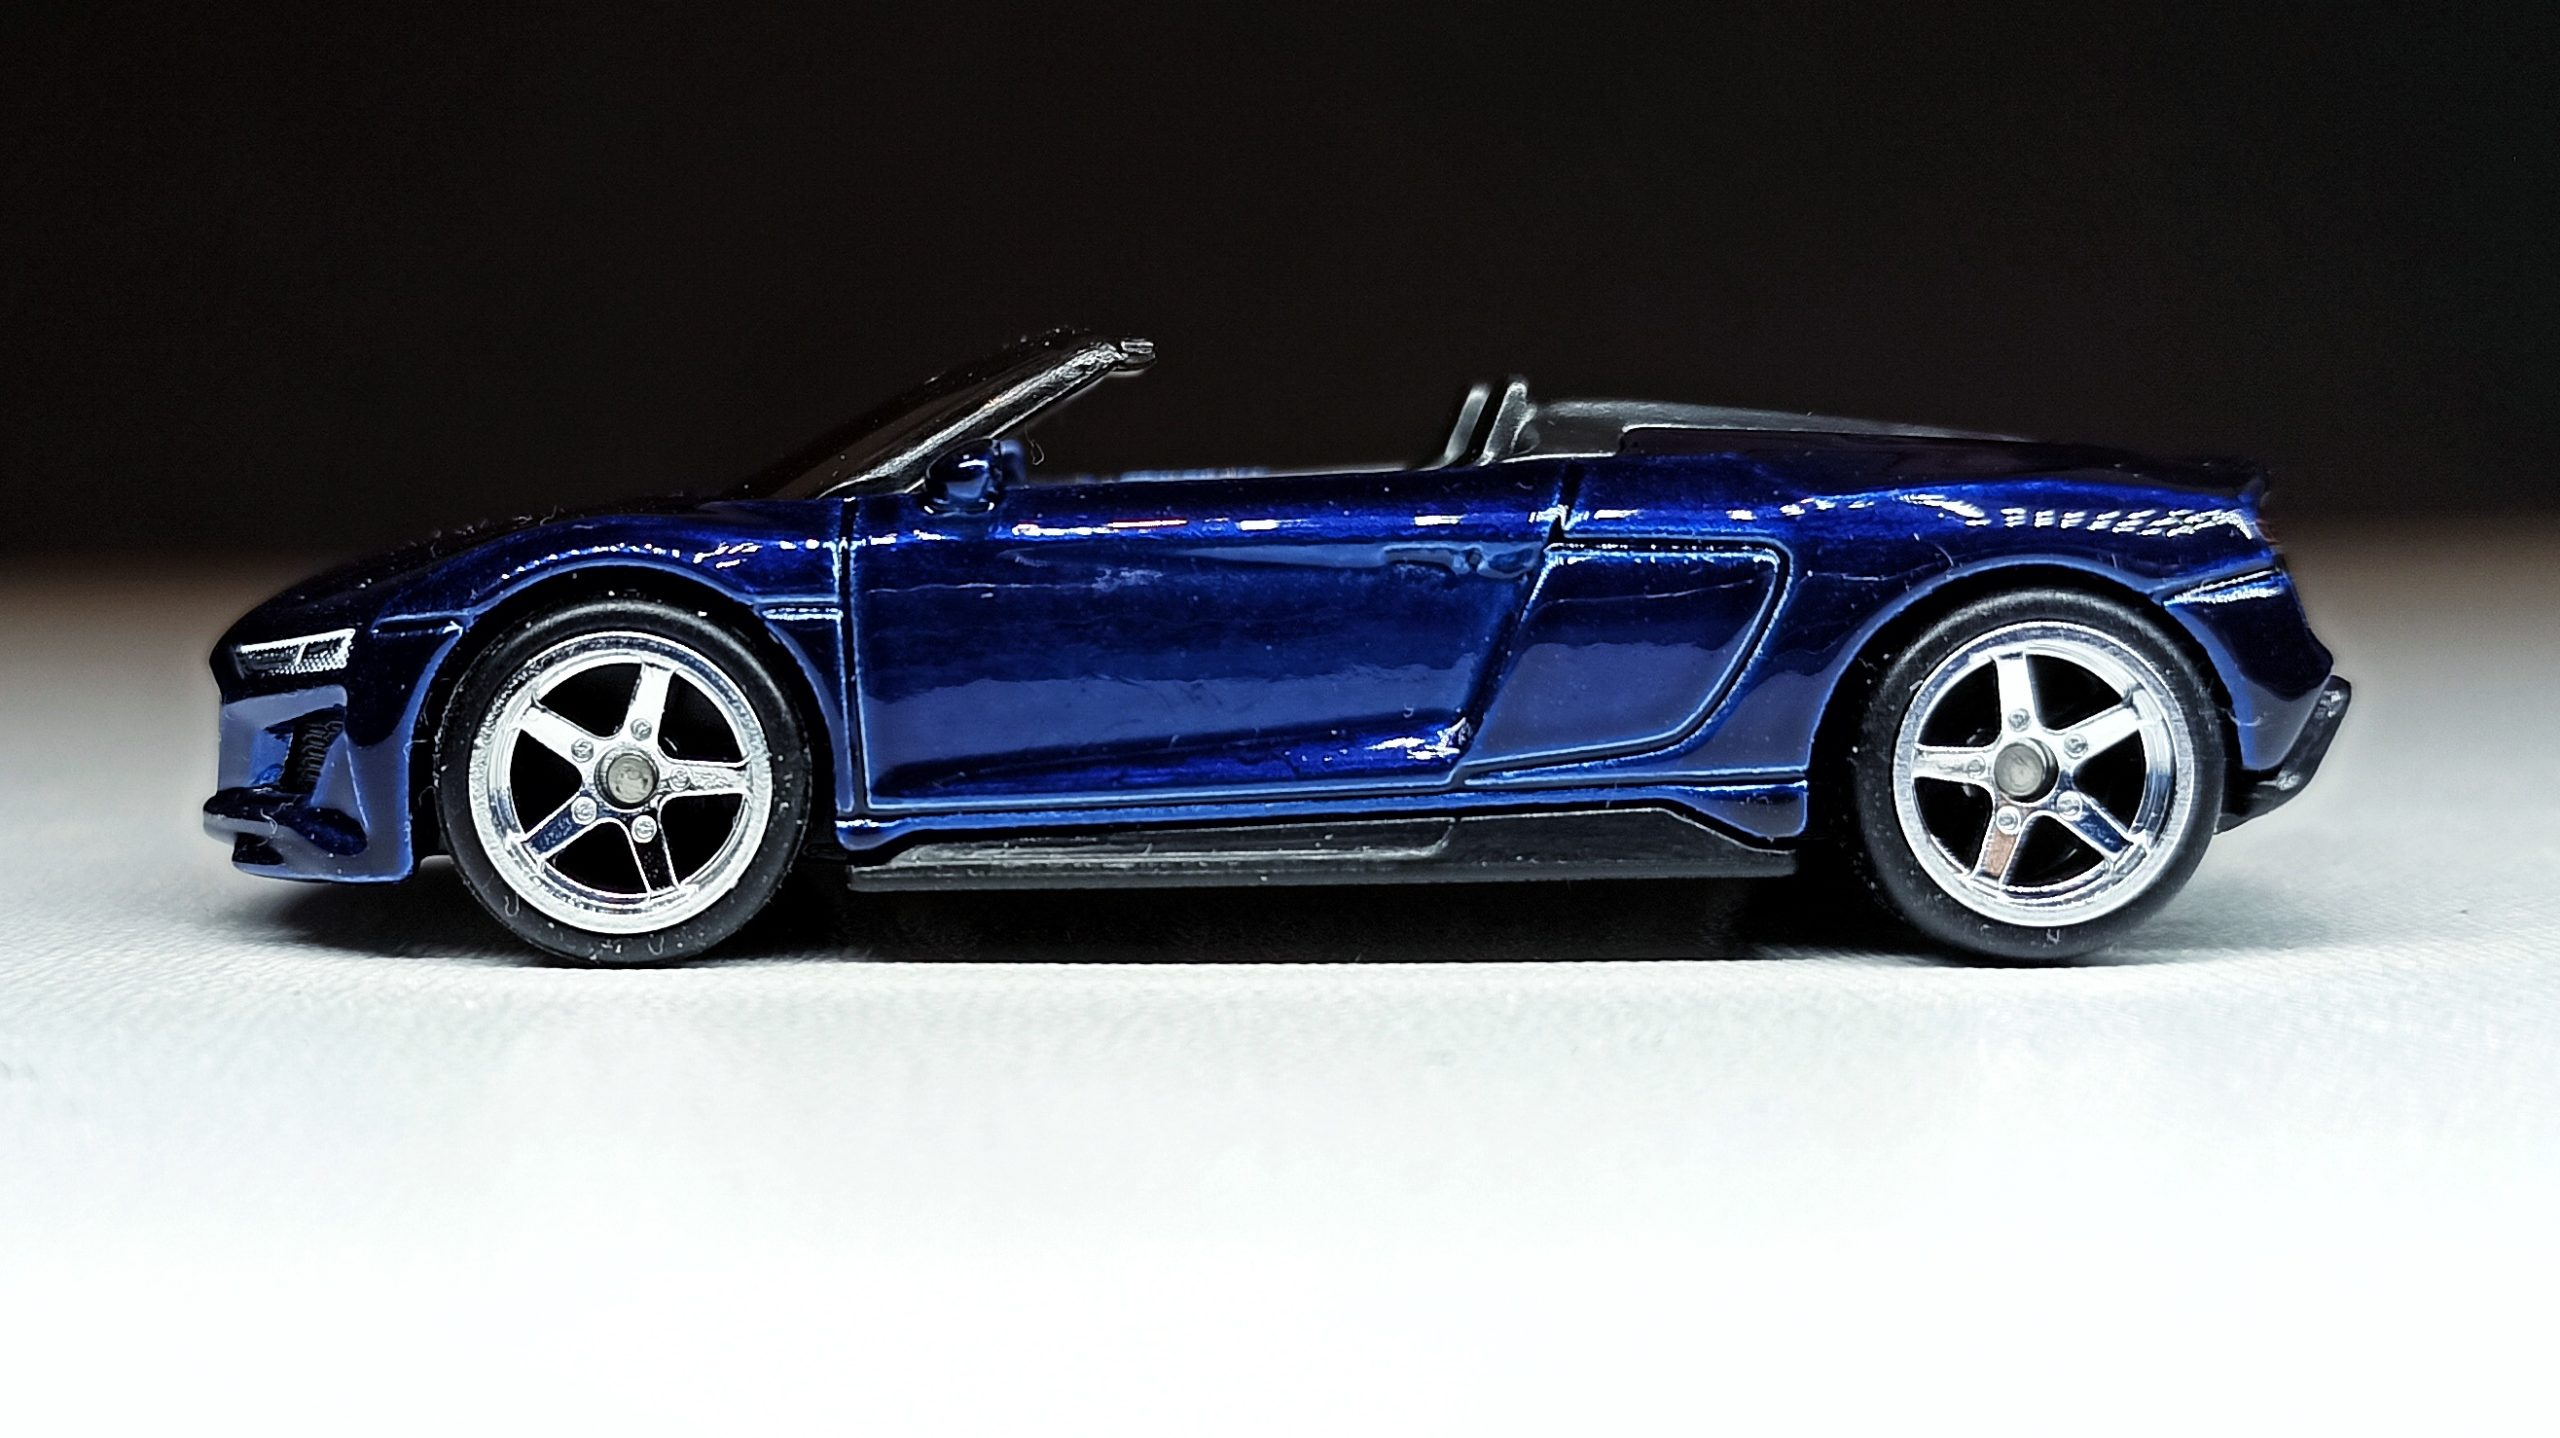 Hot Wheels 2019 Audi R8 Spyder 2021 (211/250) HW Exotics (4/10) indigo blue Super Treasure Hunt (STH) side